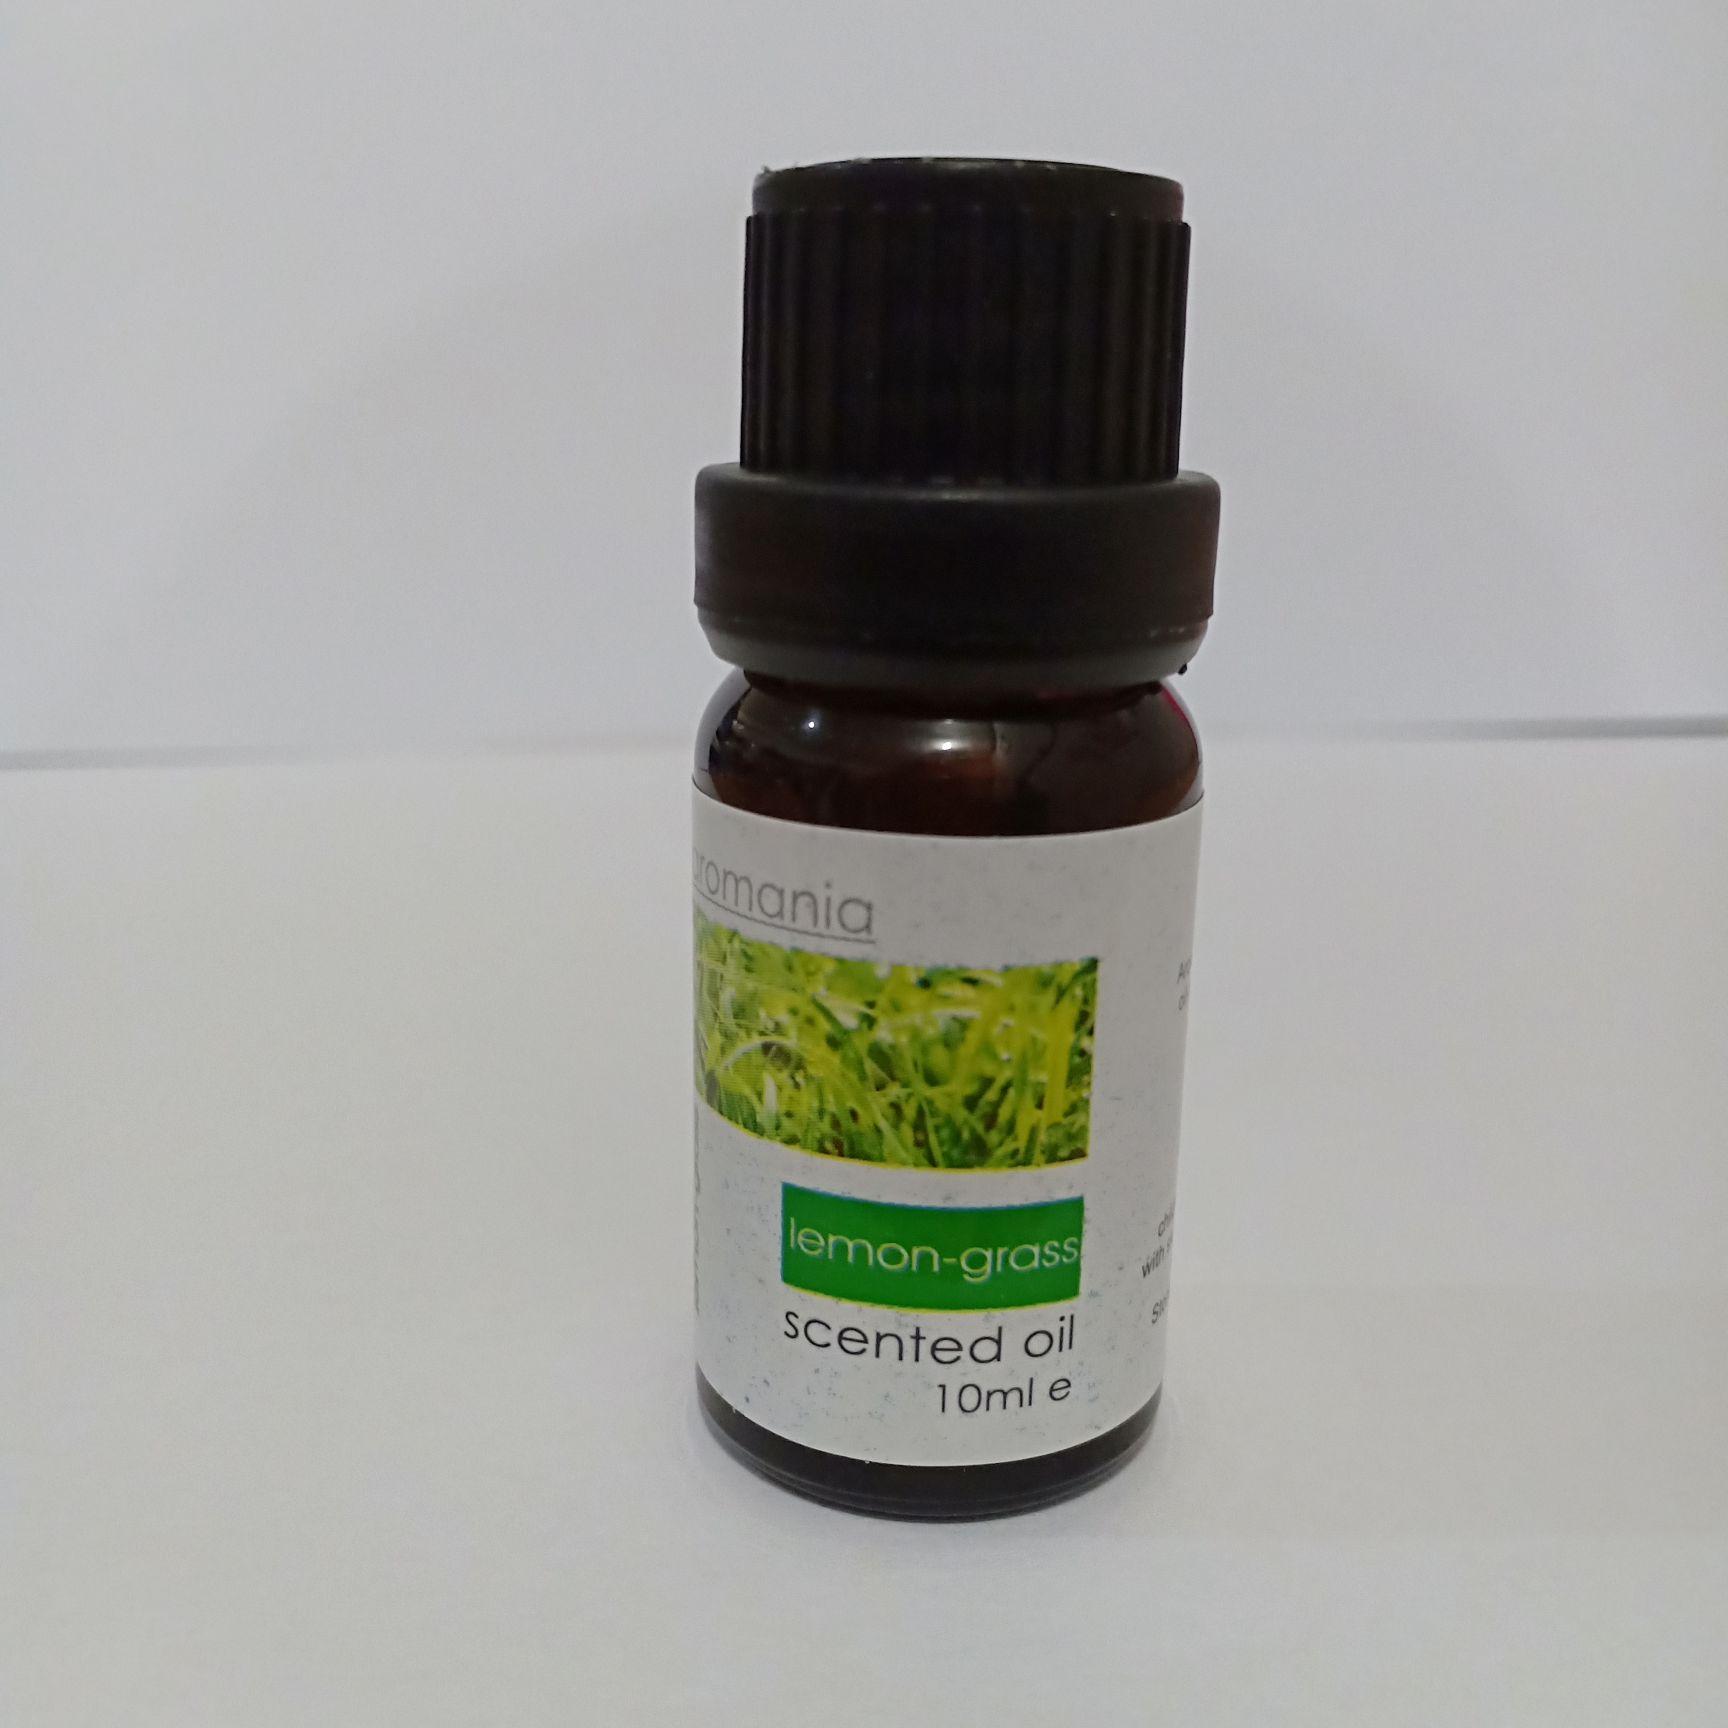 Parfum Ruangan Rumah Terbaik Twin Pack Glade Matic Spray Refill Lavender 146gr Aiueo Humidifier Lemon Grass Essential Aromatherapy Oil 10ml